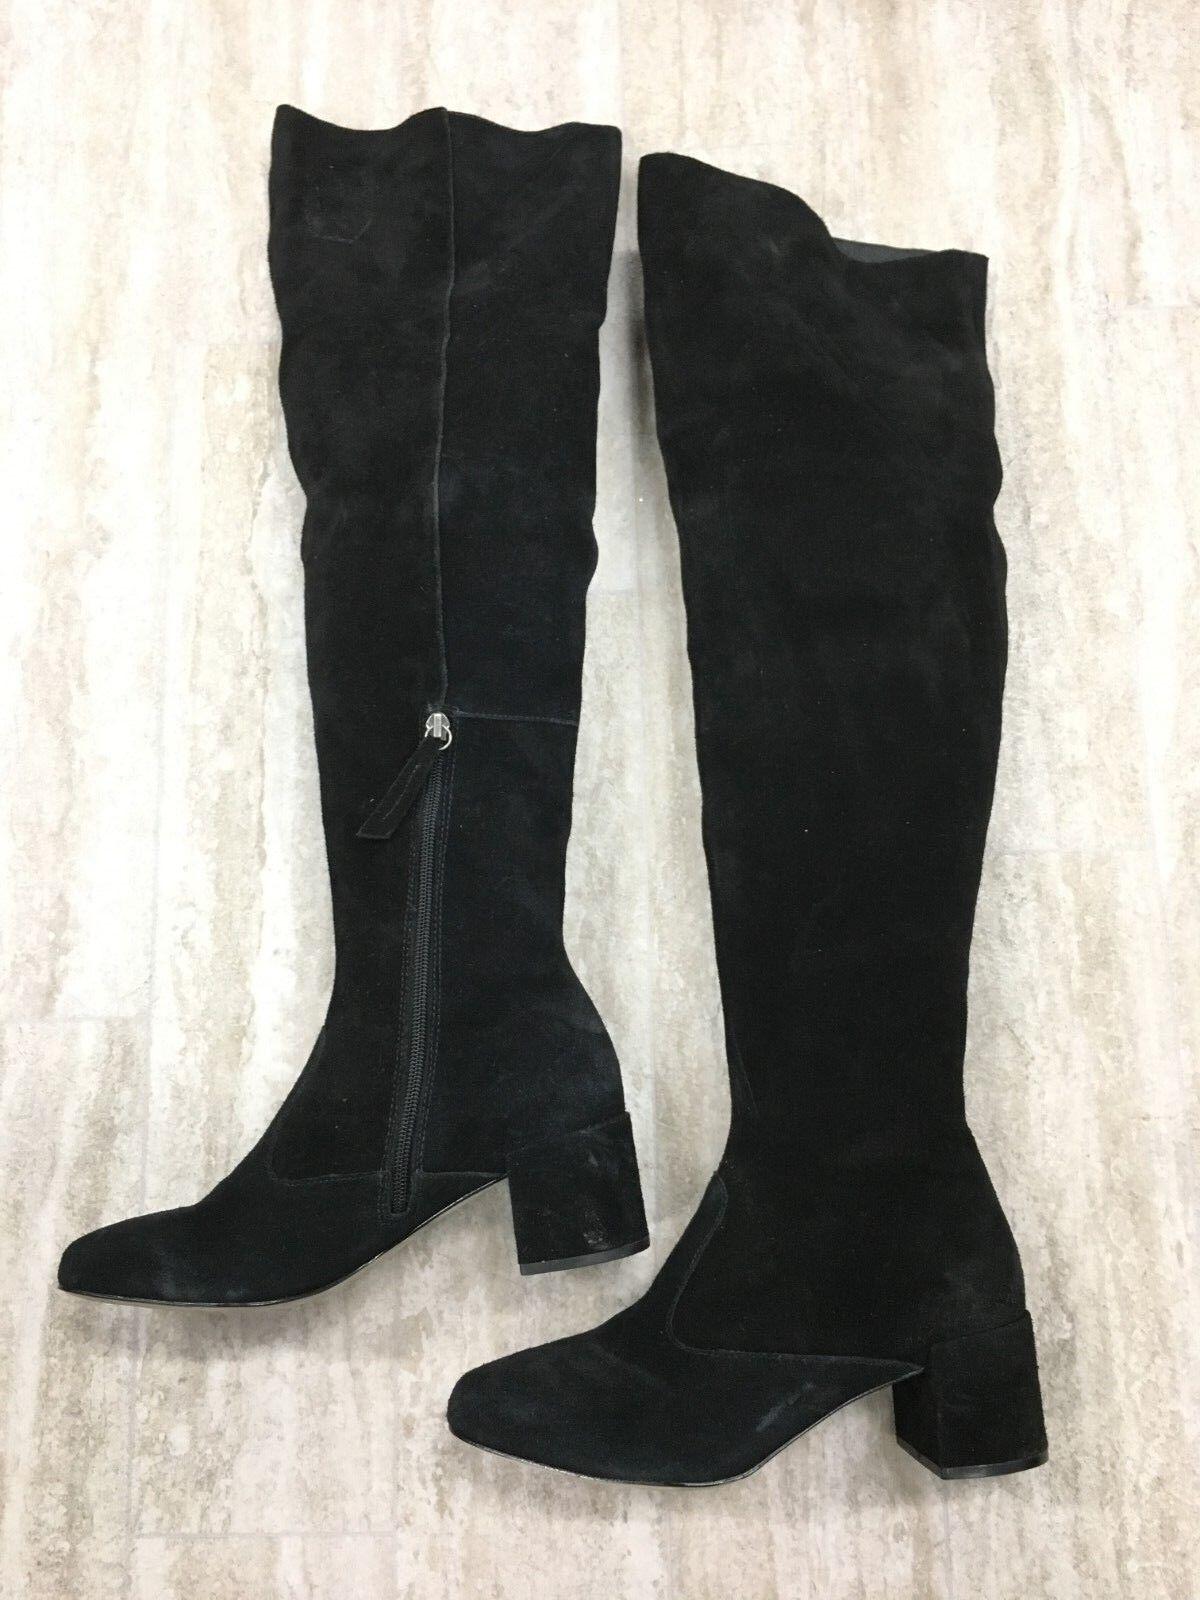 Matisse Reginald Suede Over-the-Knee Boots Size 8